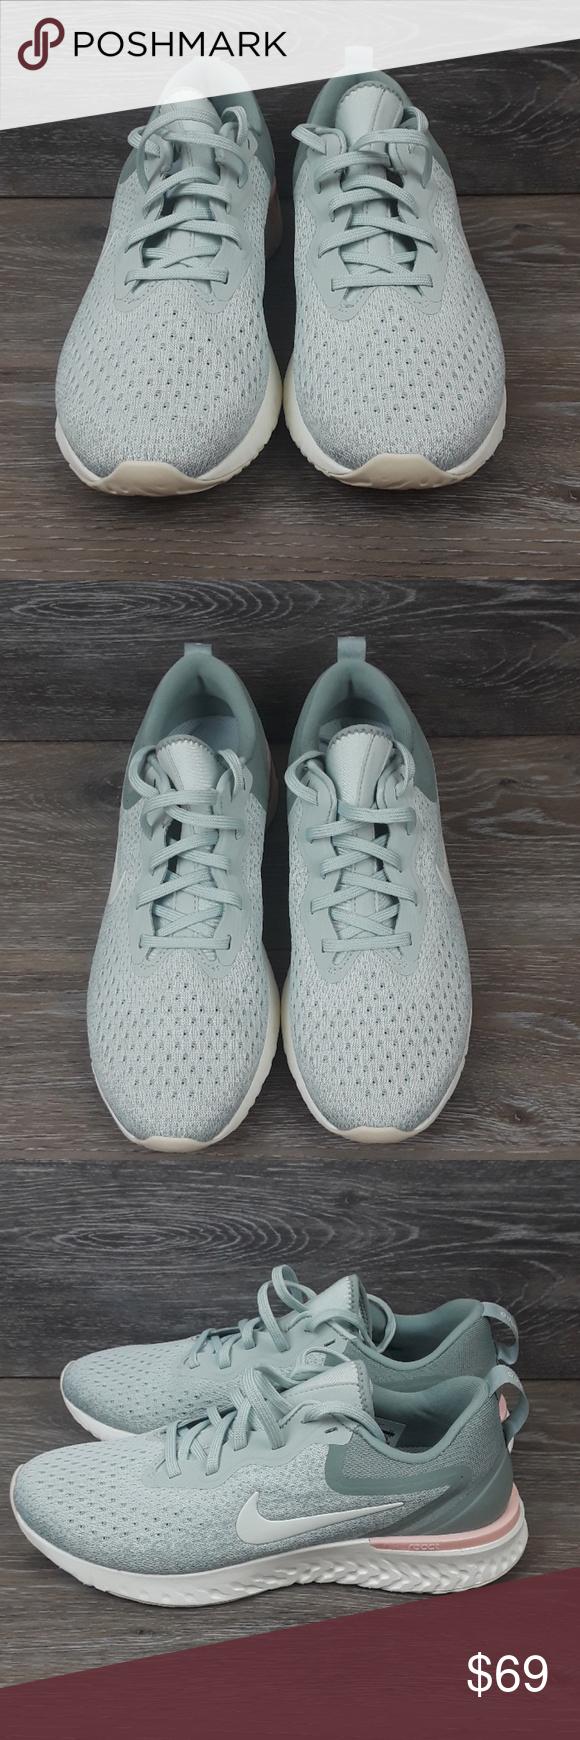 Nike womens Odyssey React Running Shoe